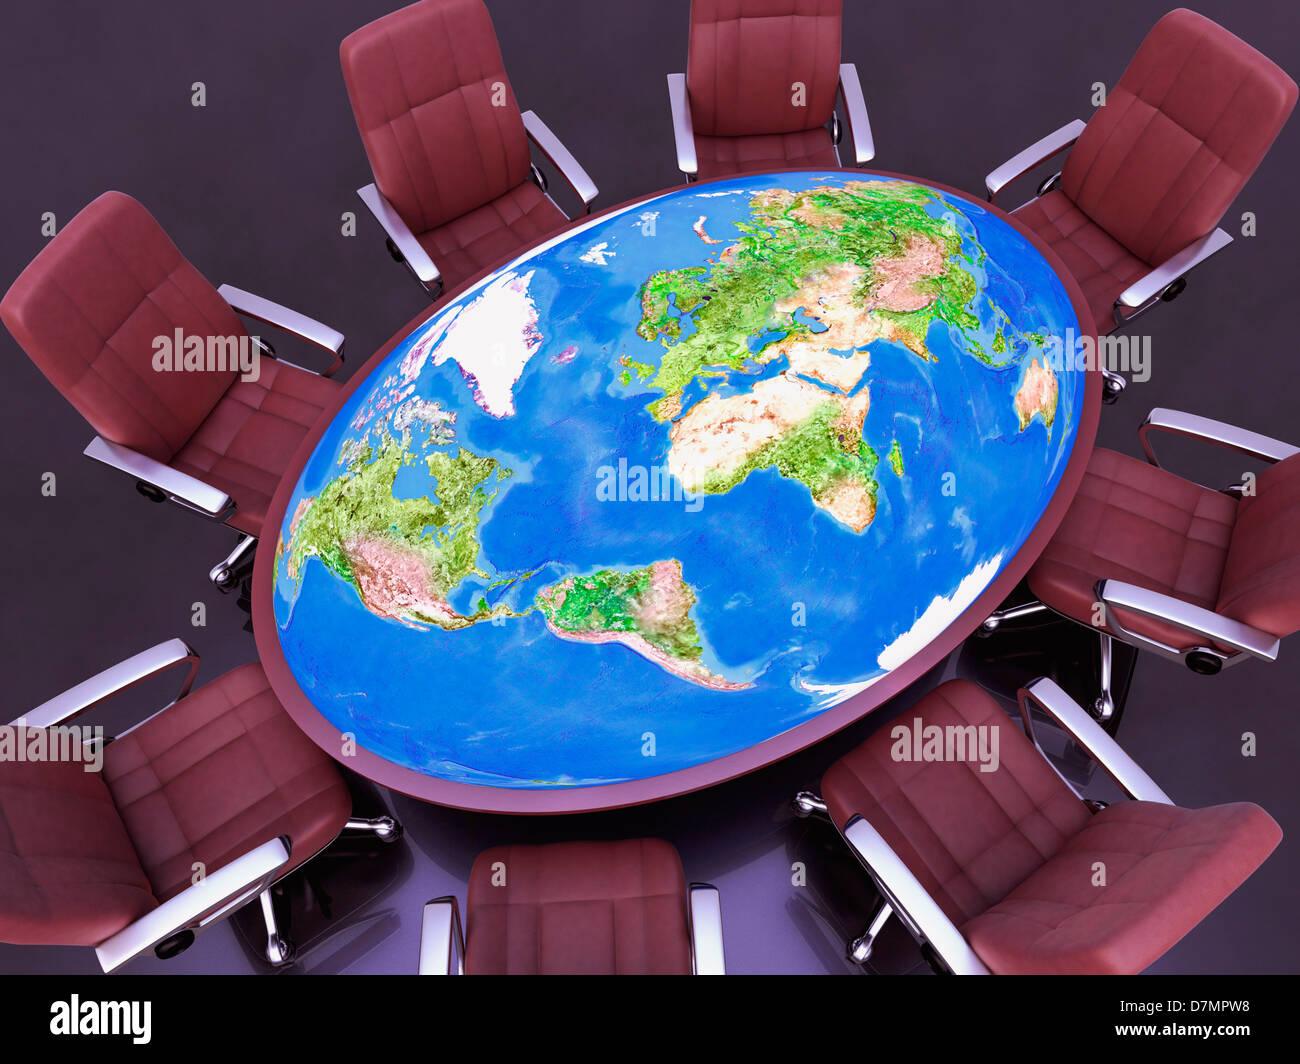 International relation, conceptual image - Stock Image